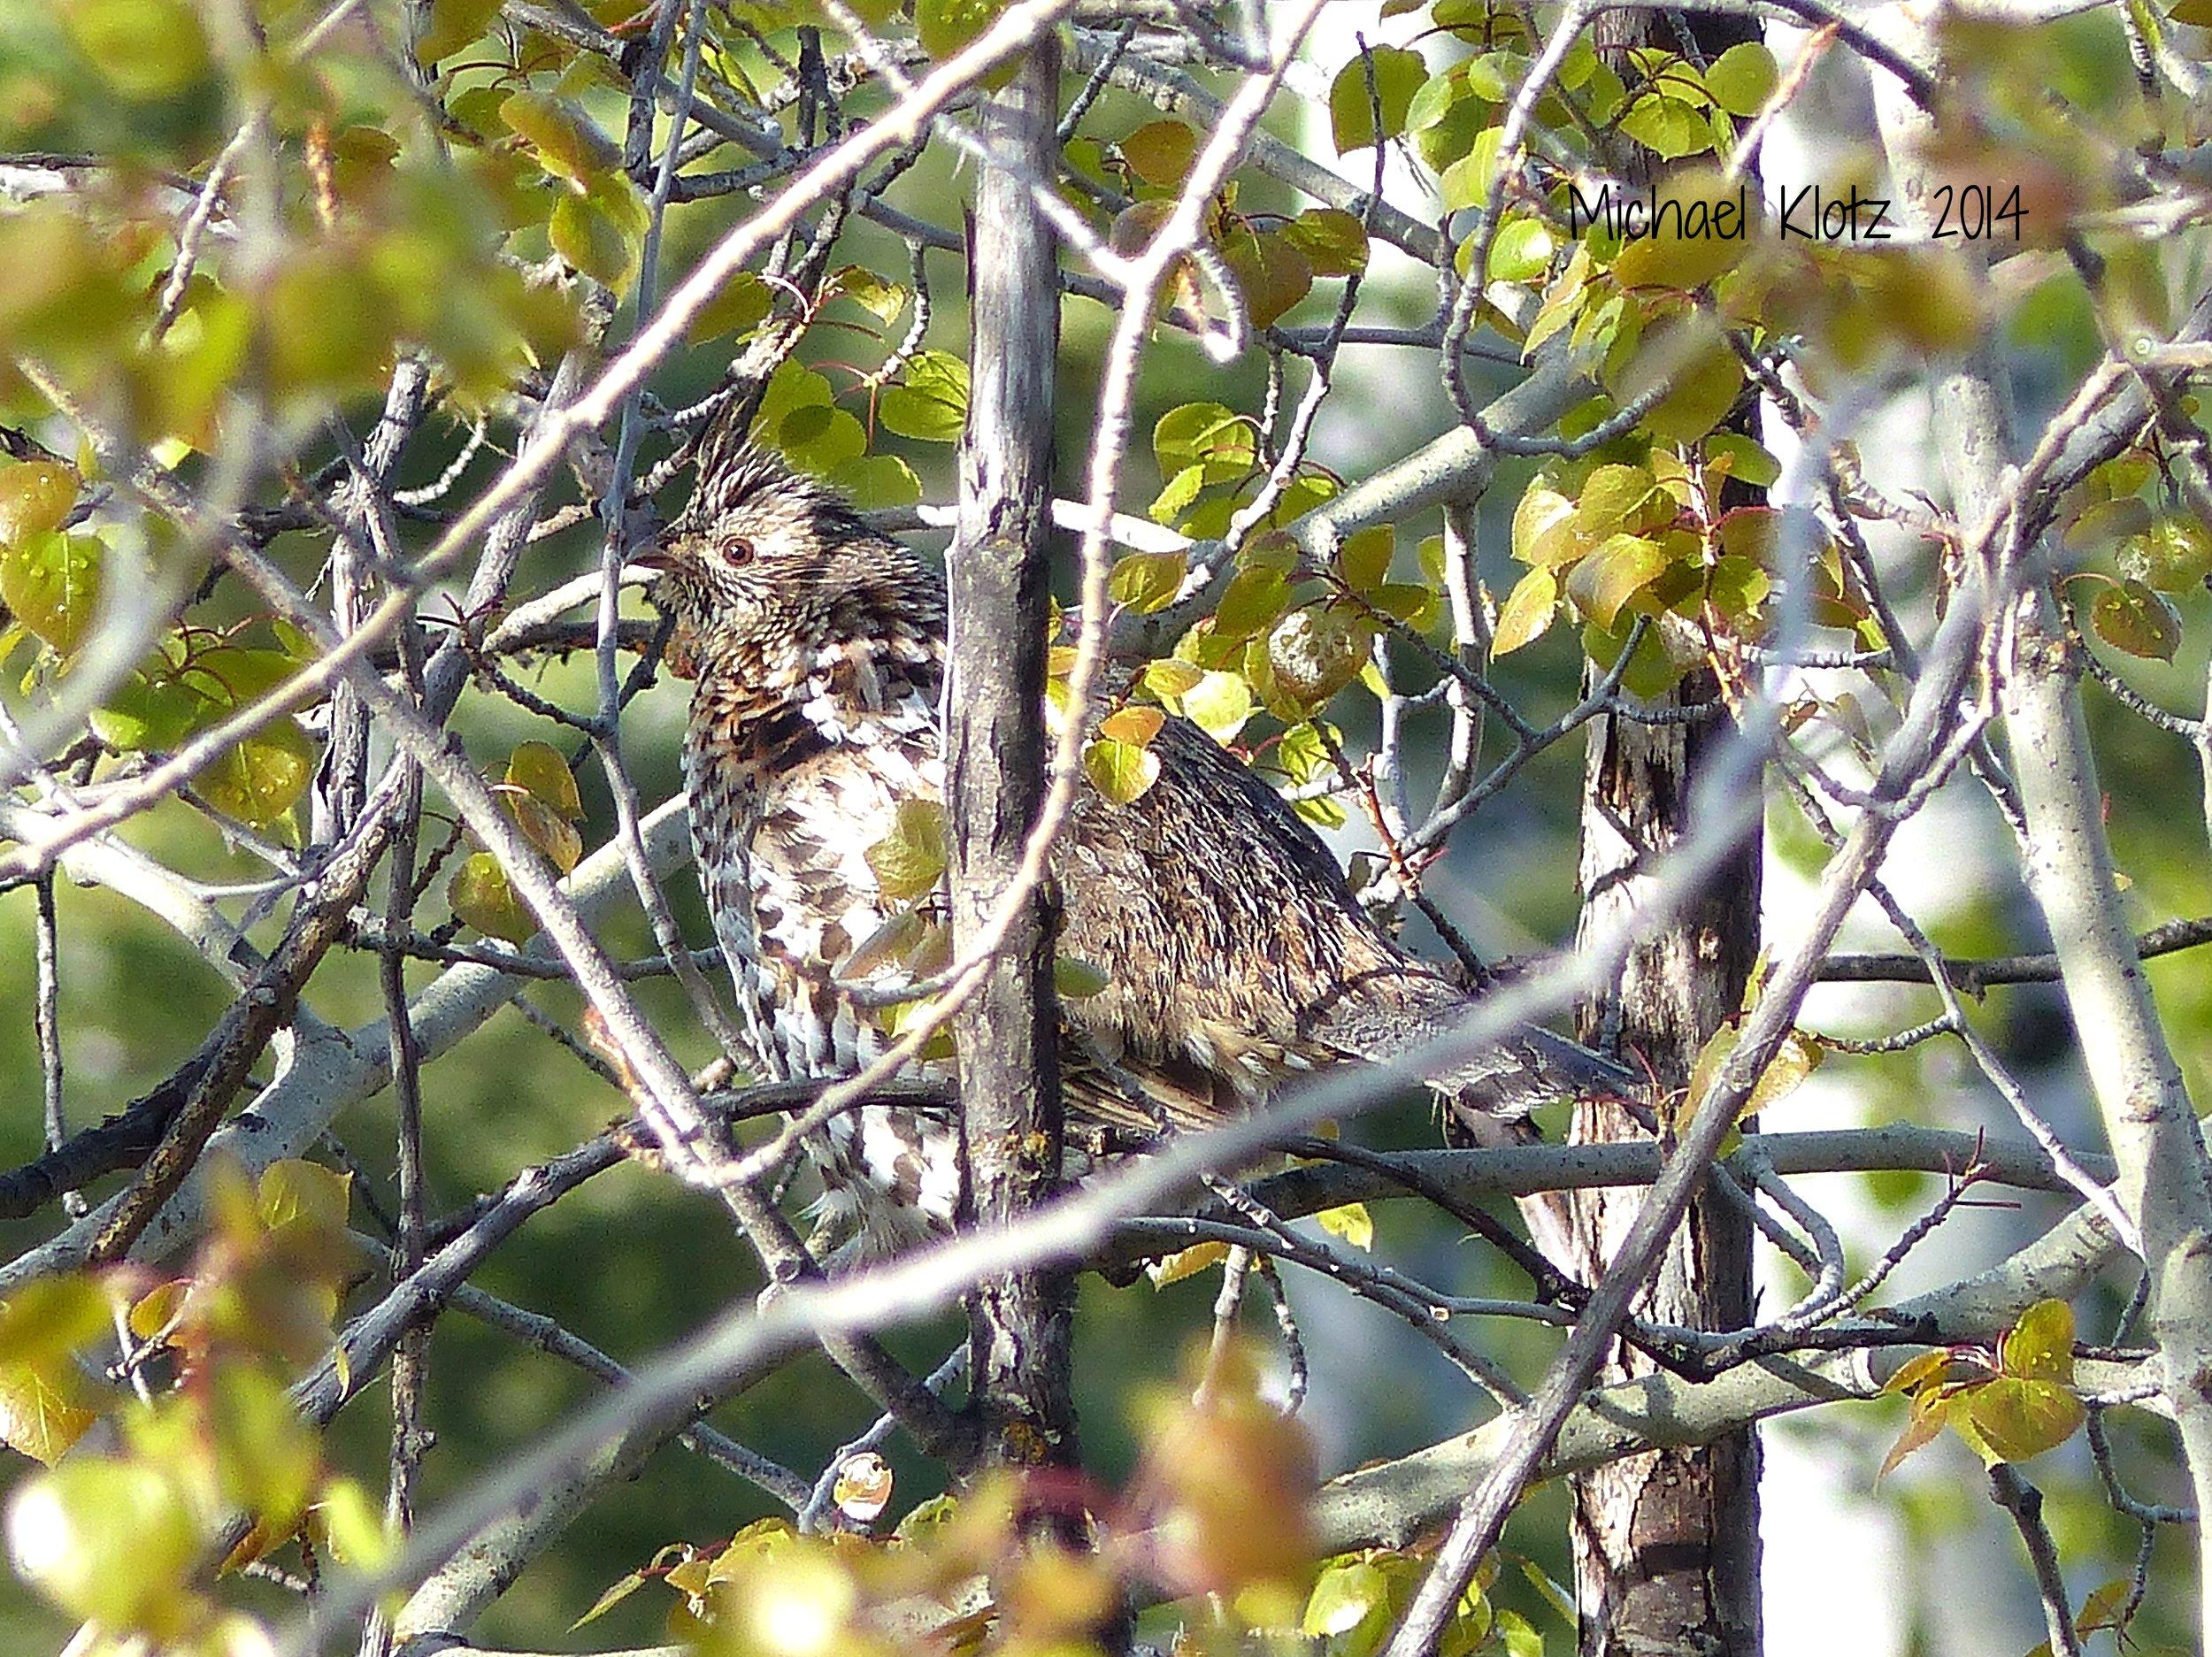 A ruffed grouse perches in an aspen tree. Photo by Michael Klotz